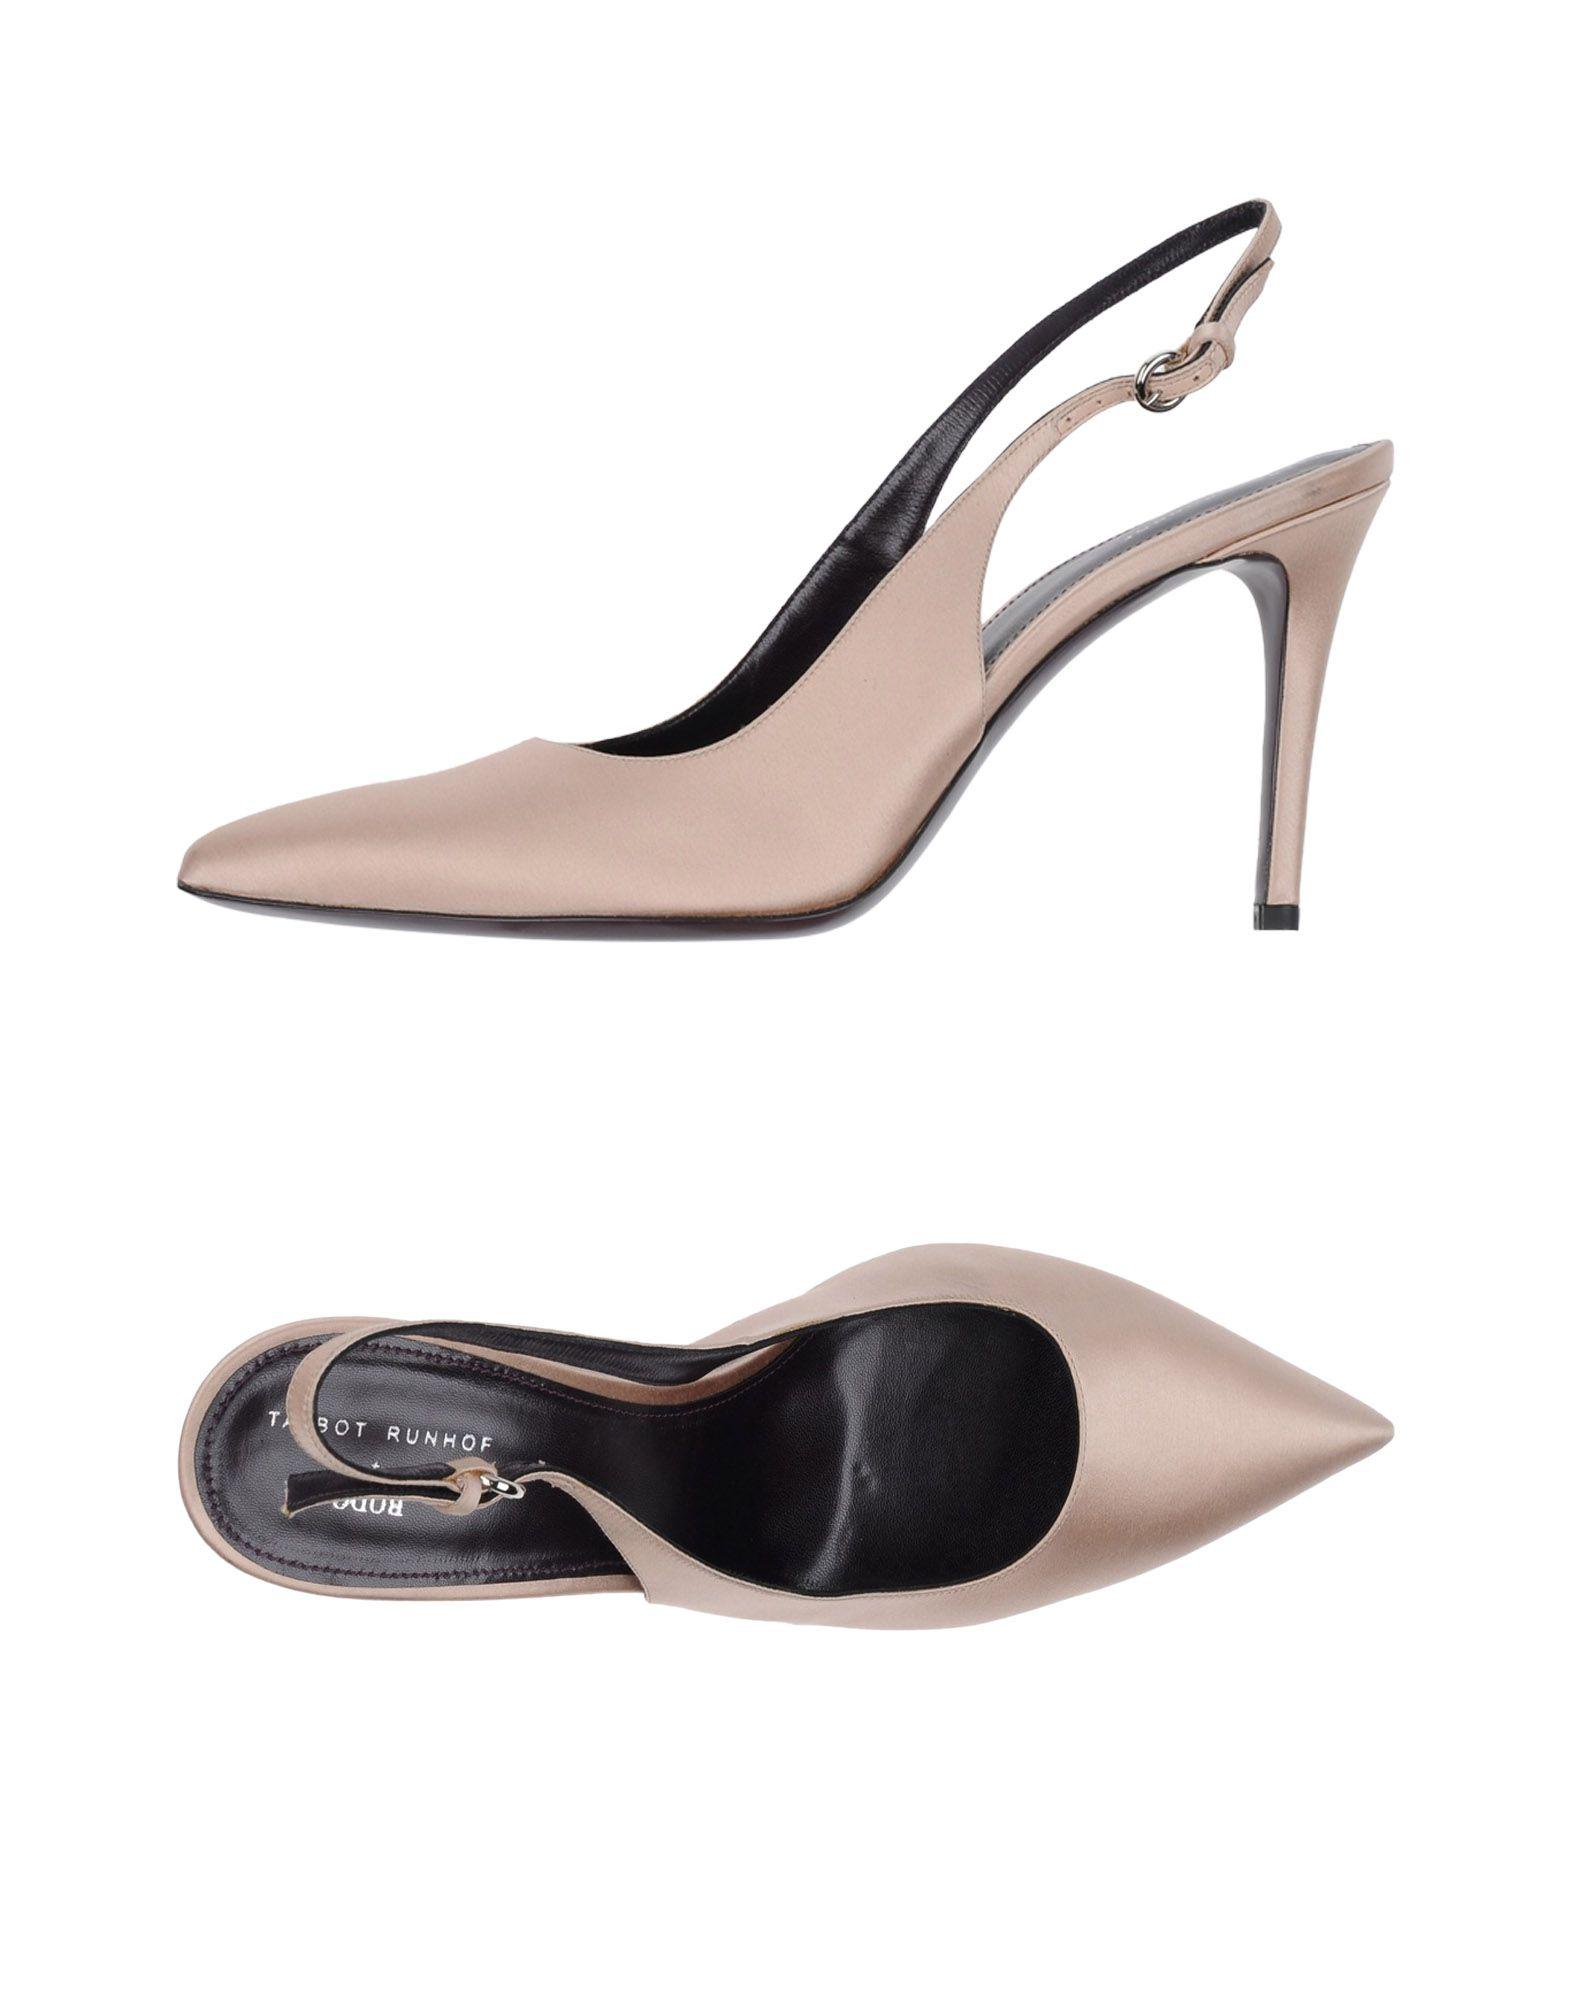 RODO + TALBOT RUNHOF Туфли цены онлайн